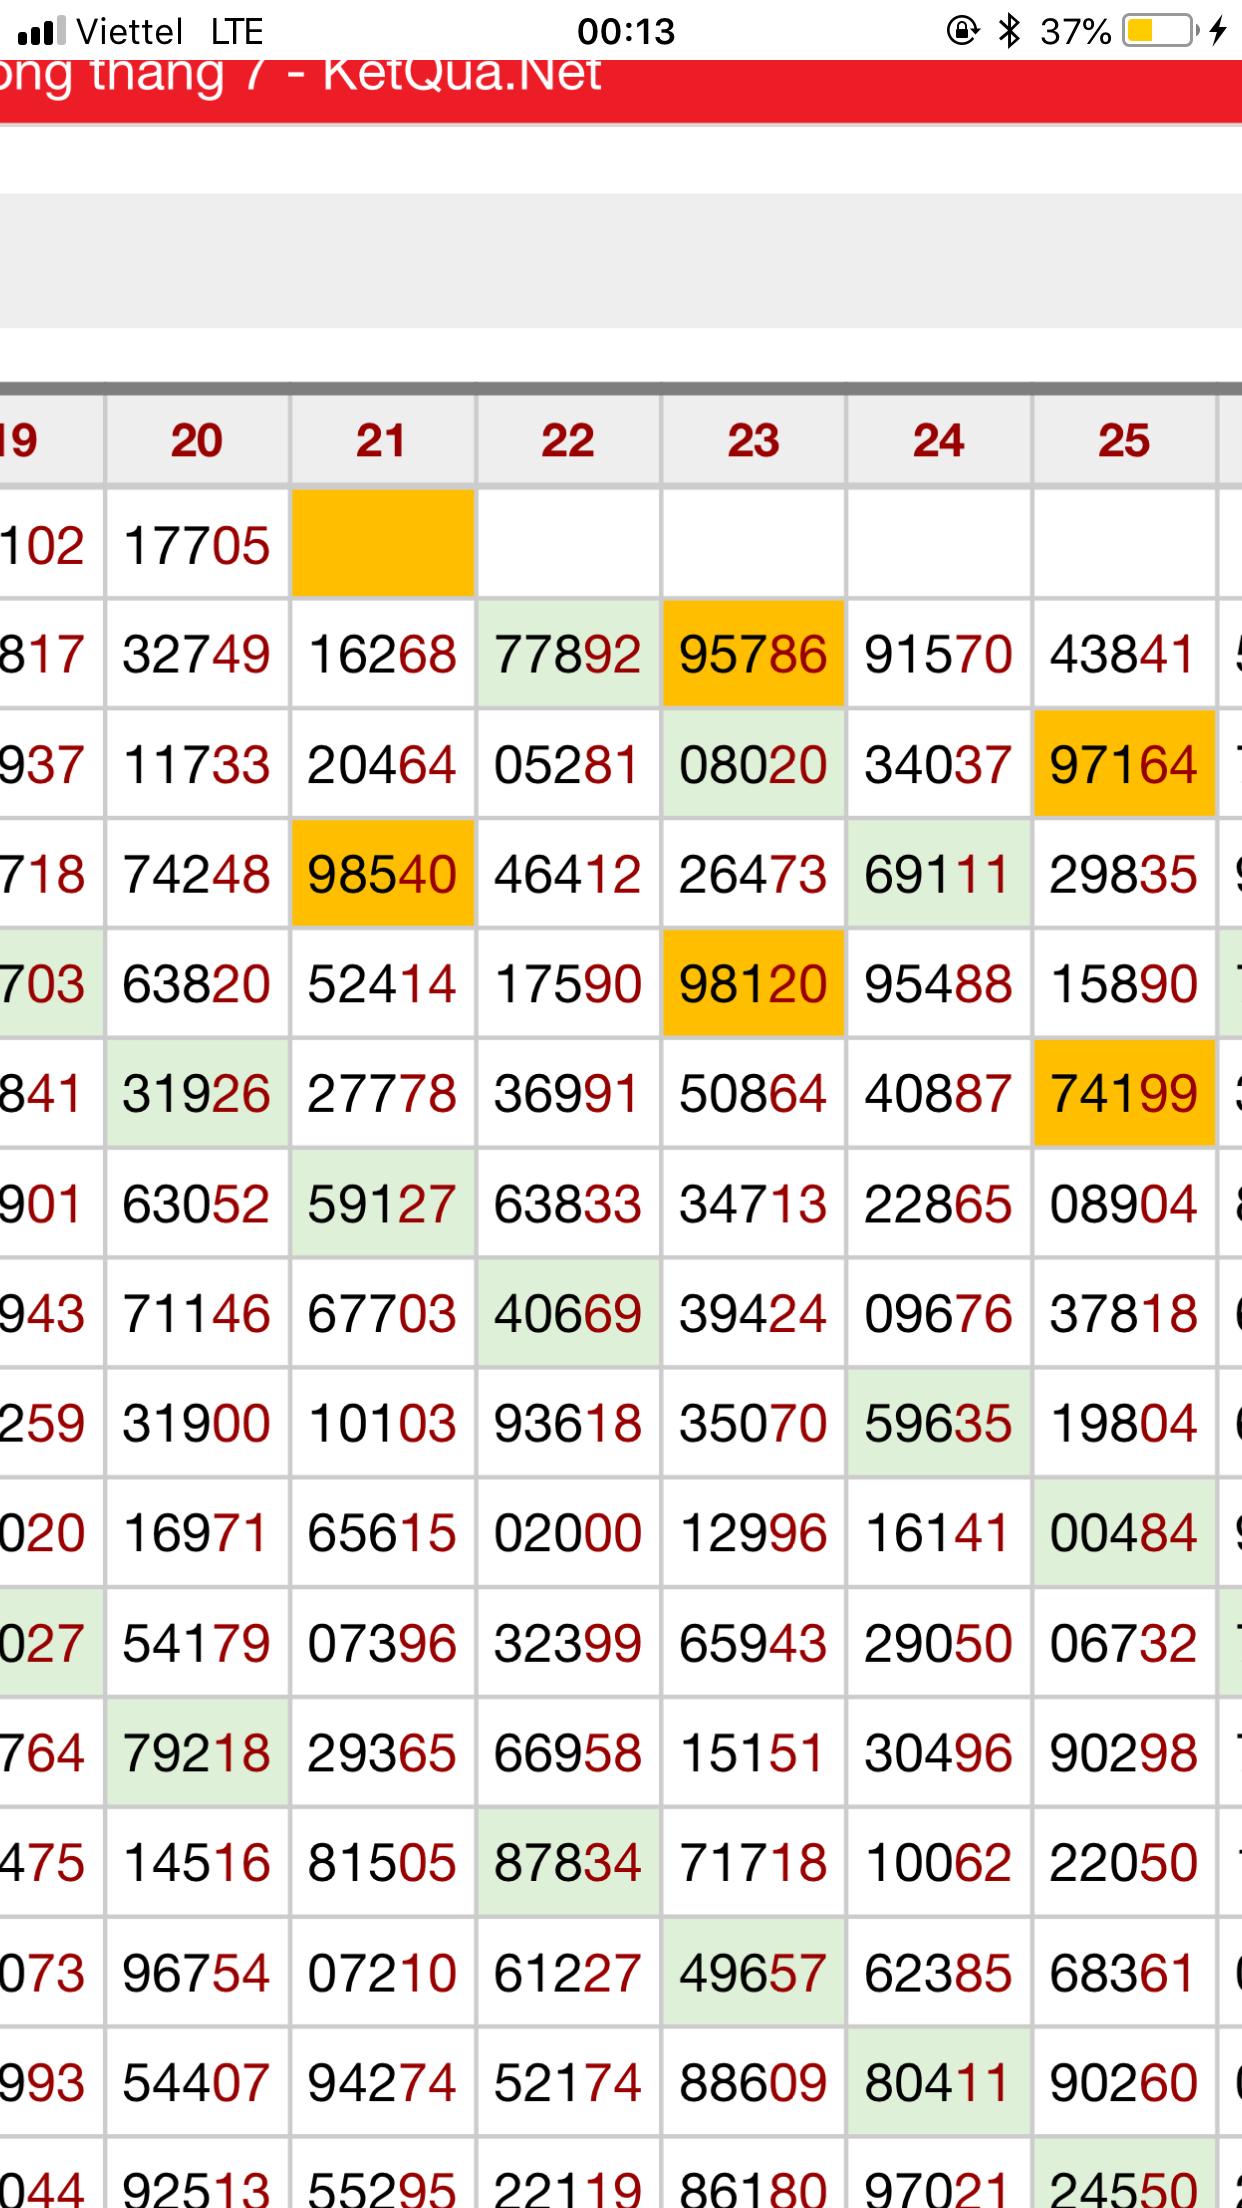 EB36E85F-5755-4A6A-B93A-C5BB7F0D4AC0.png